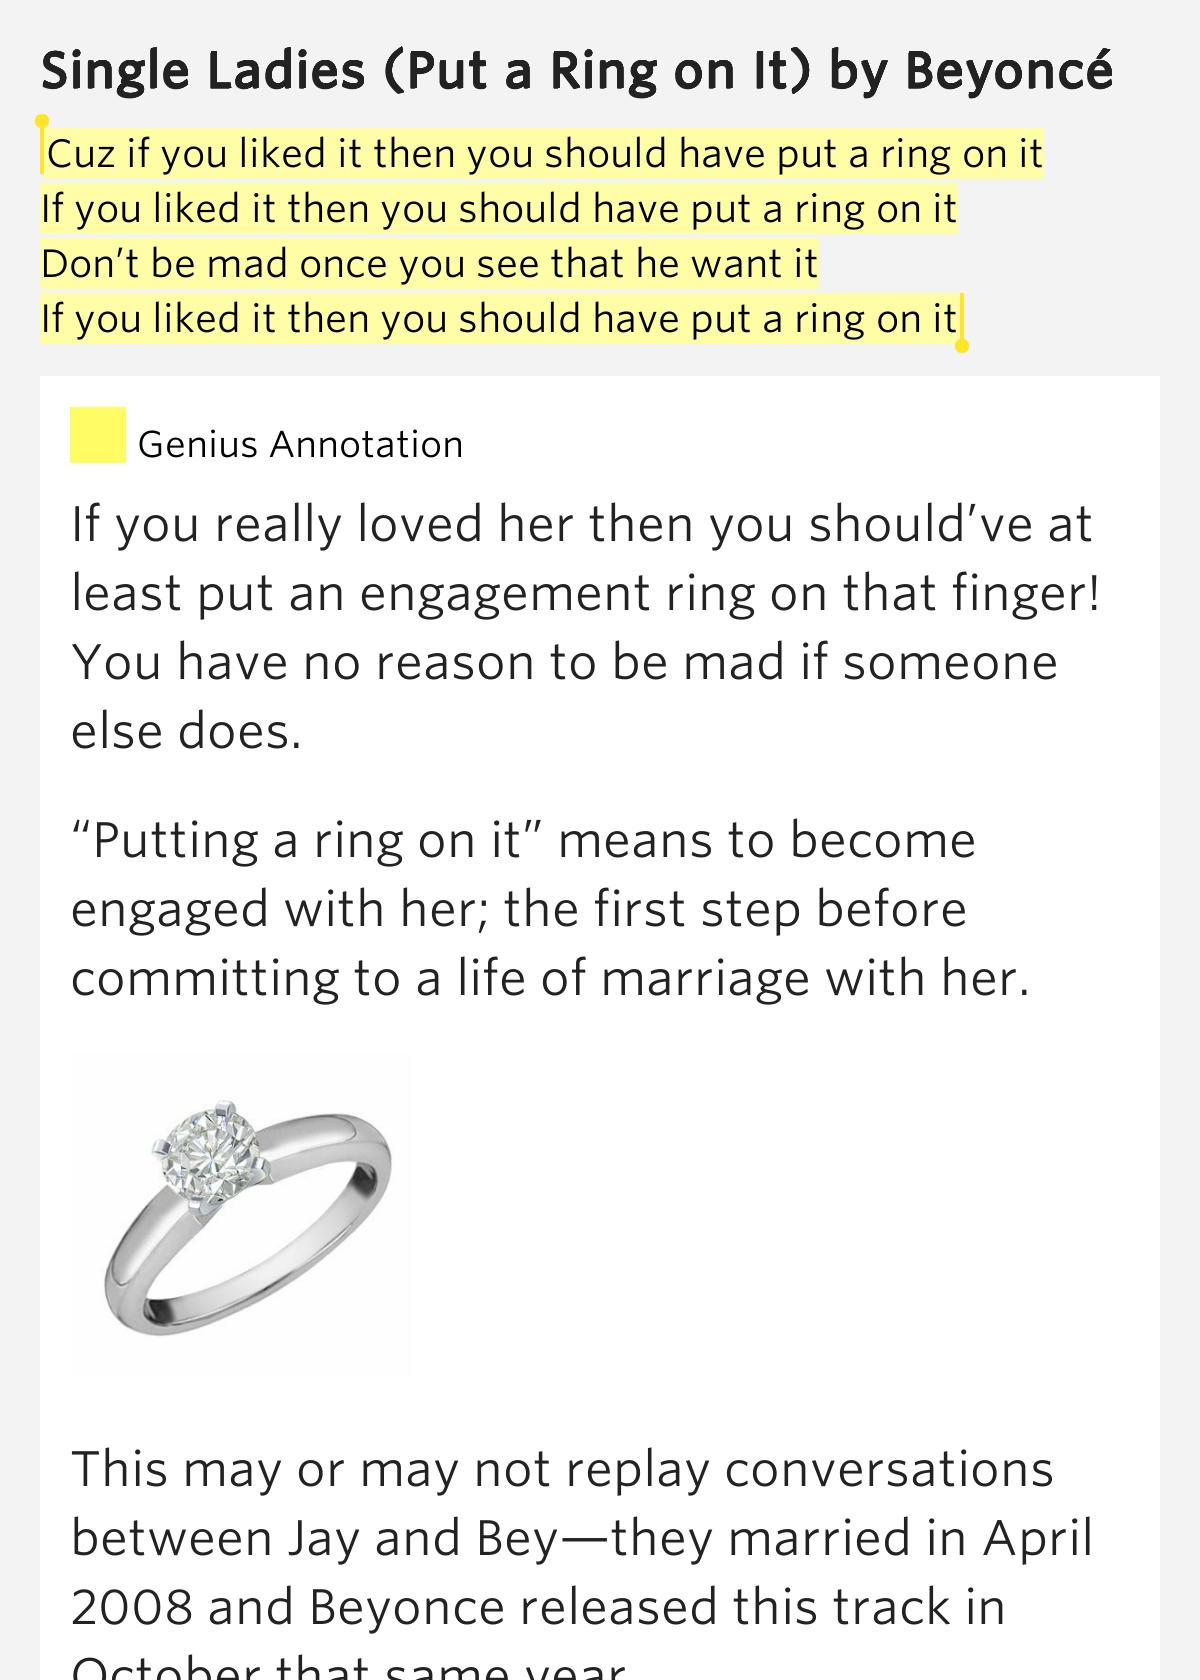 single ladies put a ring on it put traduction